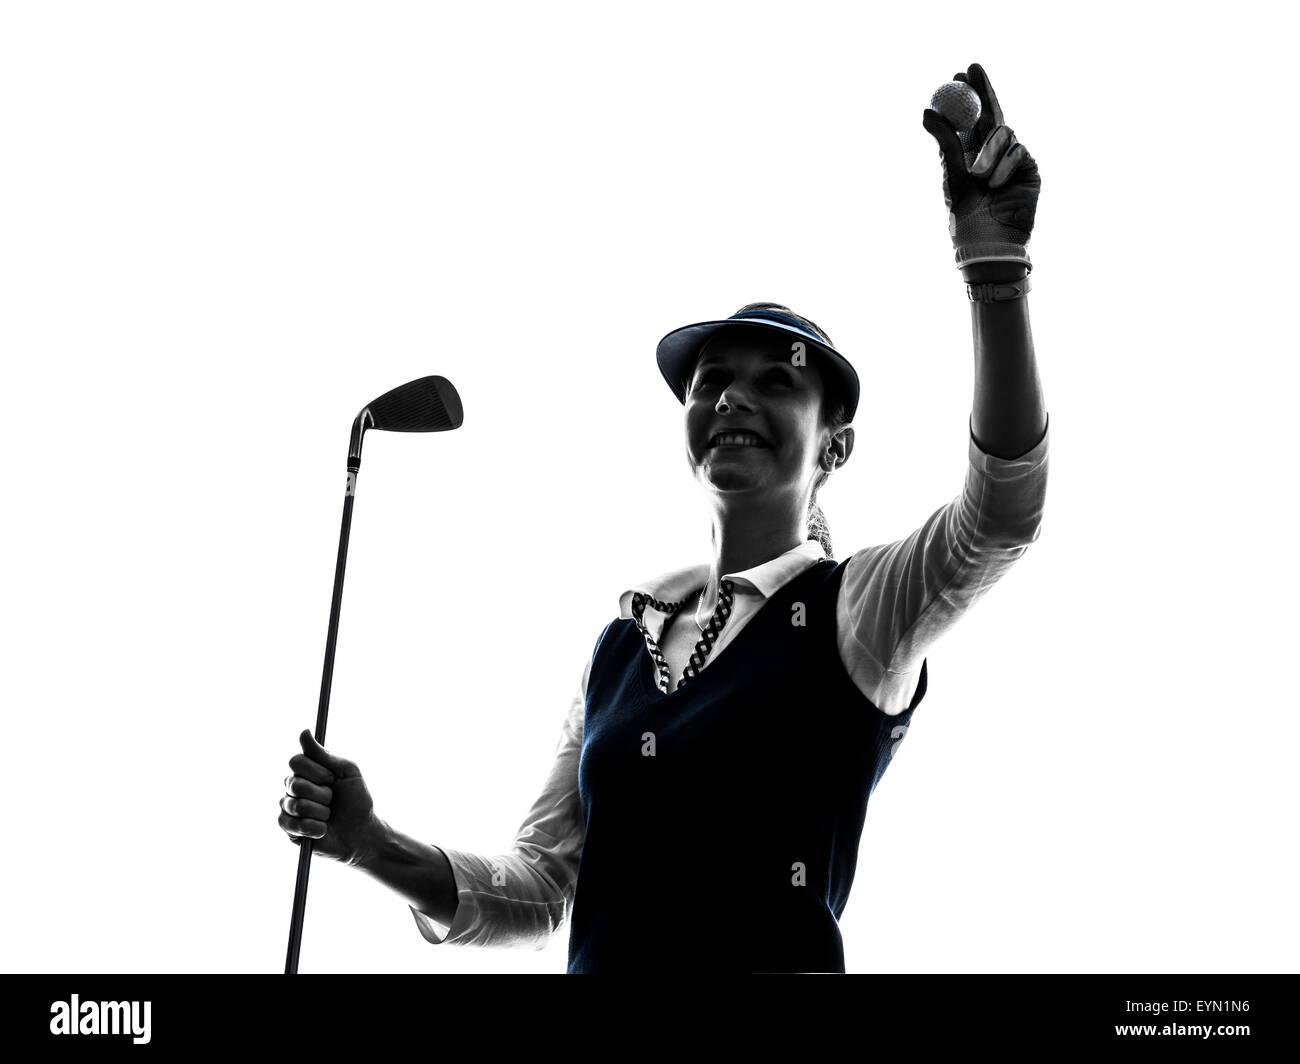 Golfer Happy Shot Stockfotos Golfer Happy Shot Bilder Seite 2